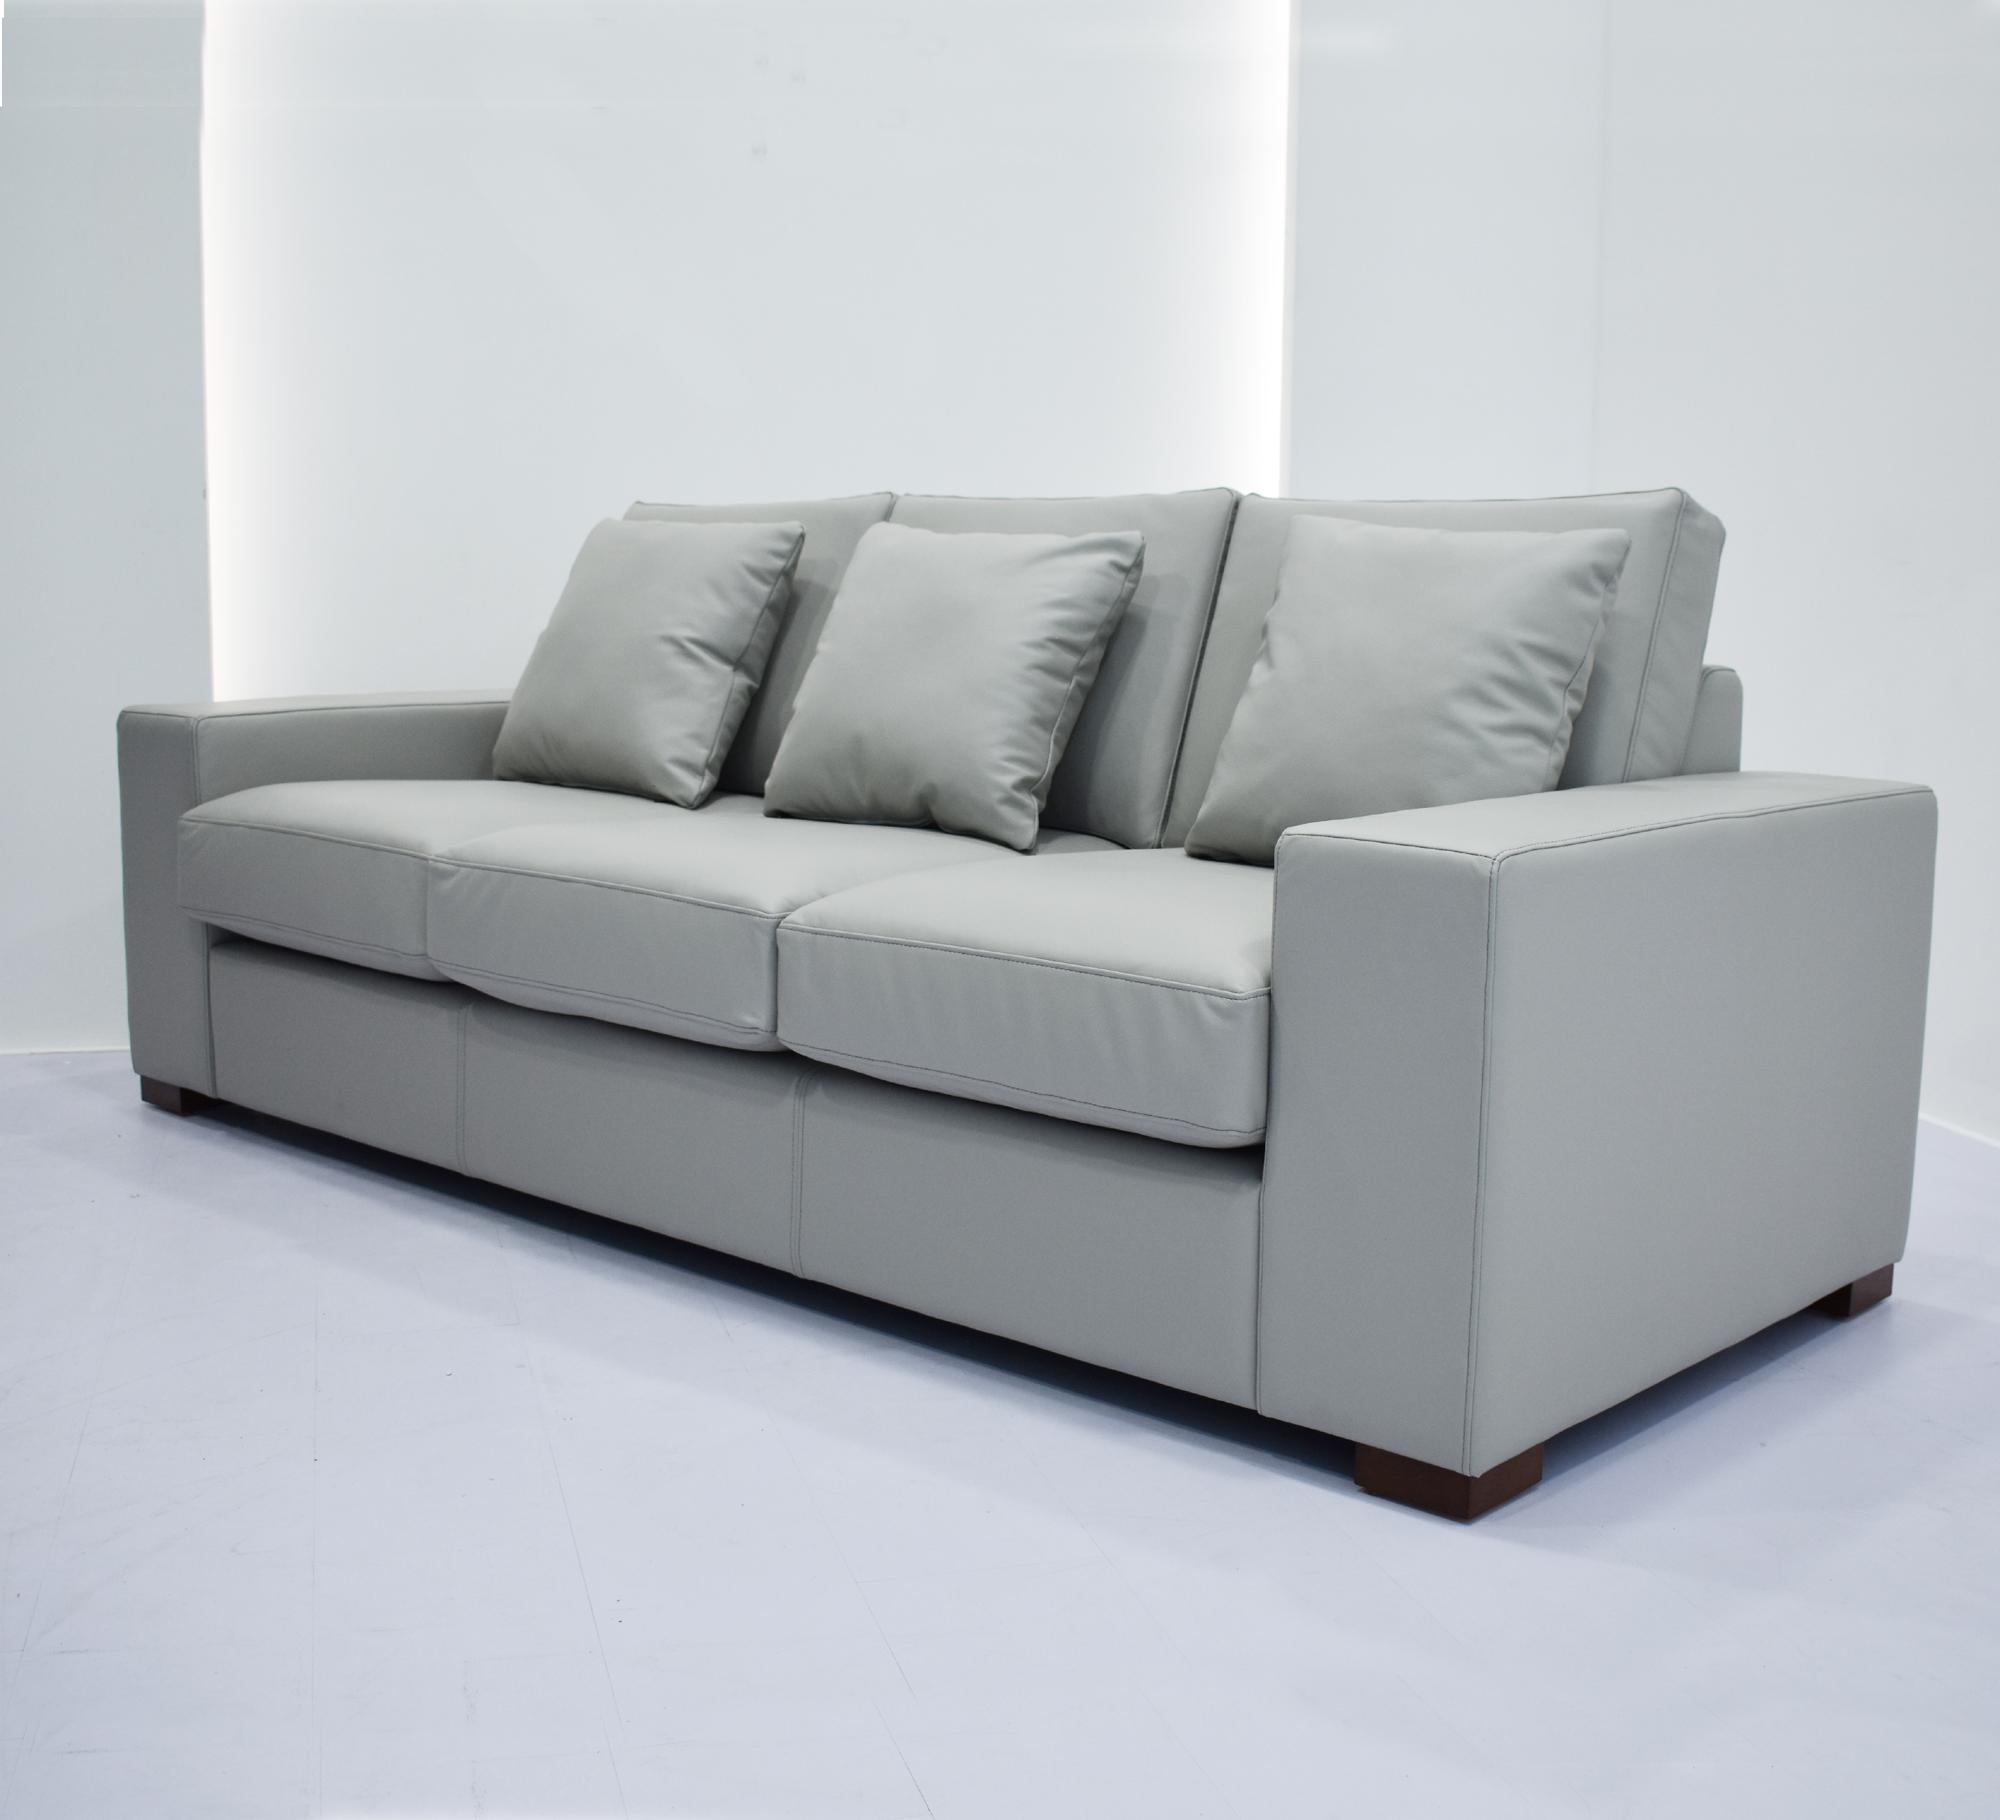 Big 3 Seater Leather Sofa Design 6162-3# - Buy Andrew Sofa,Aniline ...